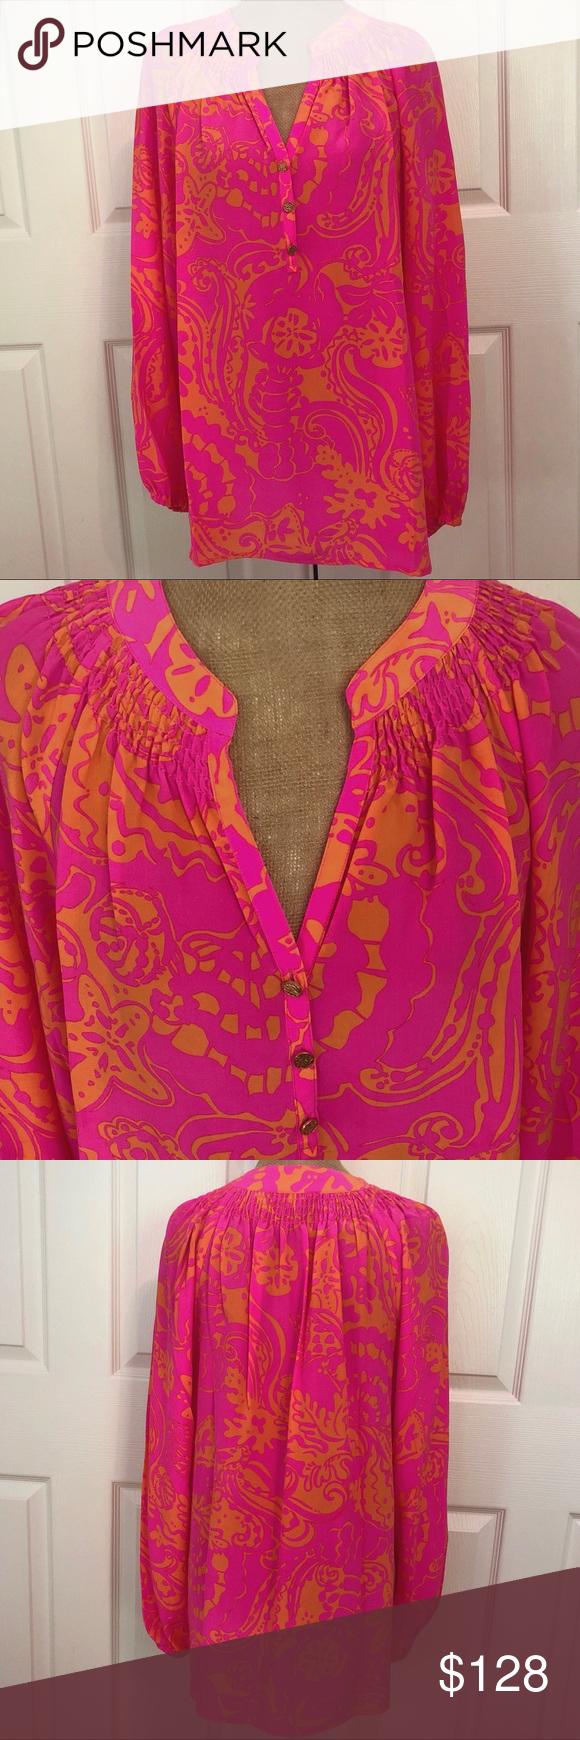 Hot pink and orange dress  EUC Lilly Pulitzer Silk Elsa Top Pink Seaesta L  My Posh Closet